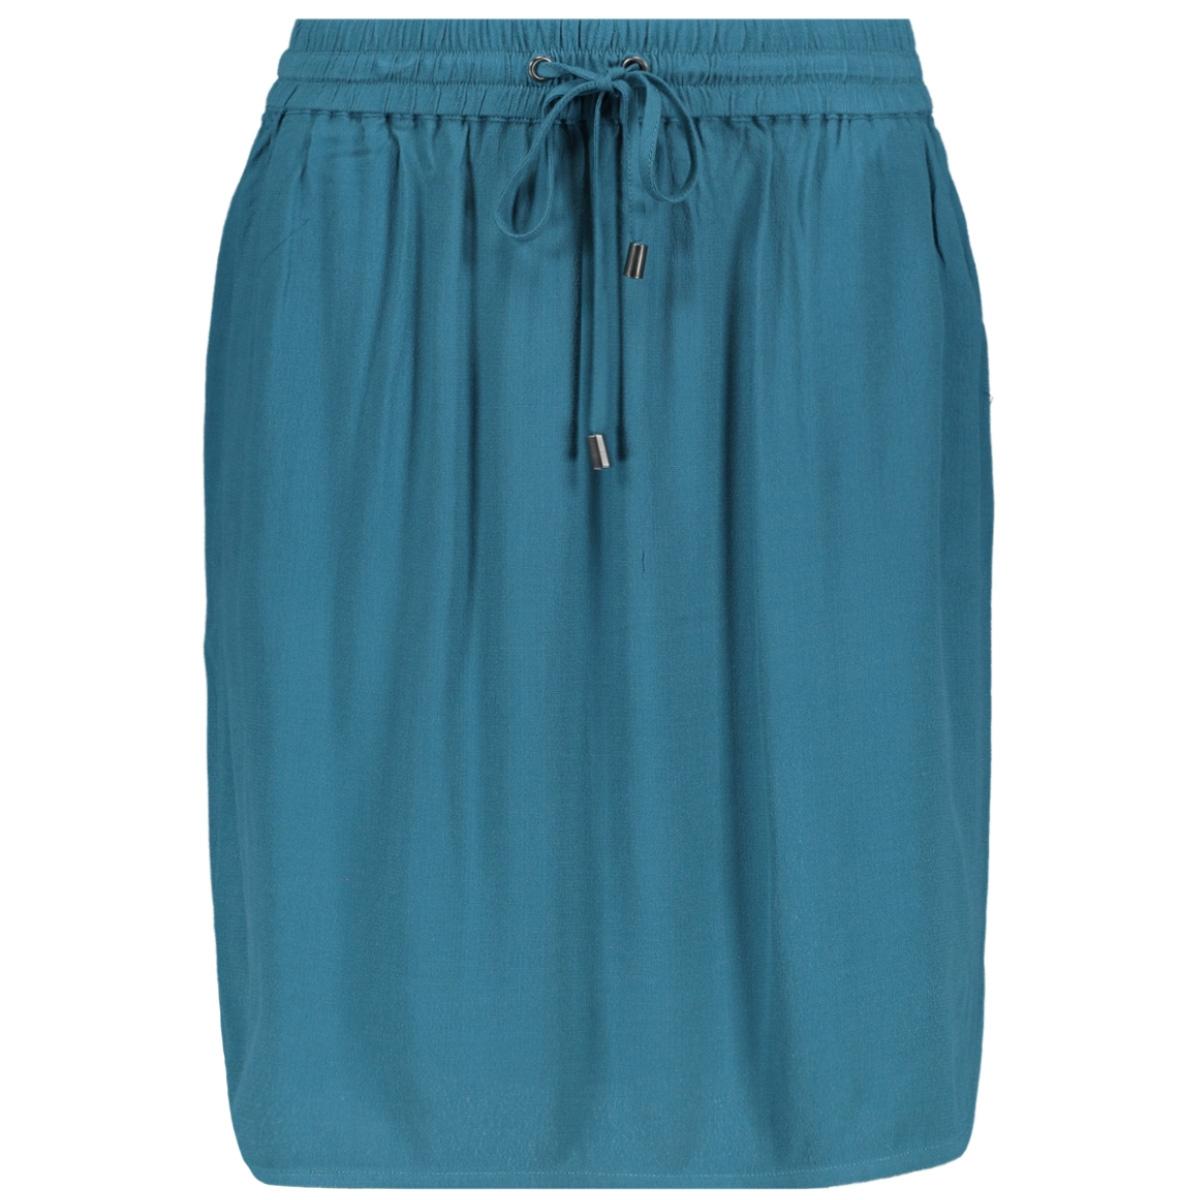 elastic waist skirt r8155 saint tropez rok 8309 dragonfly